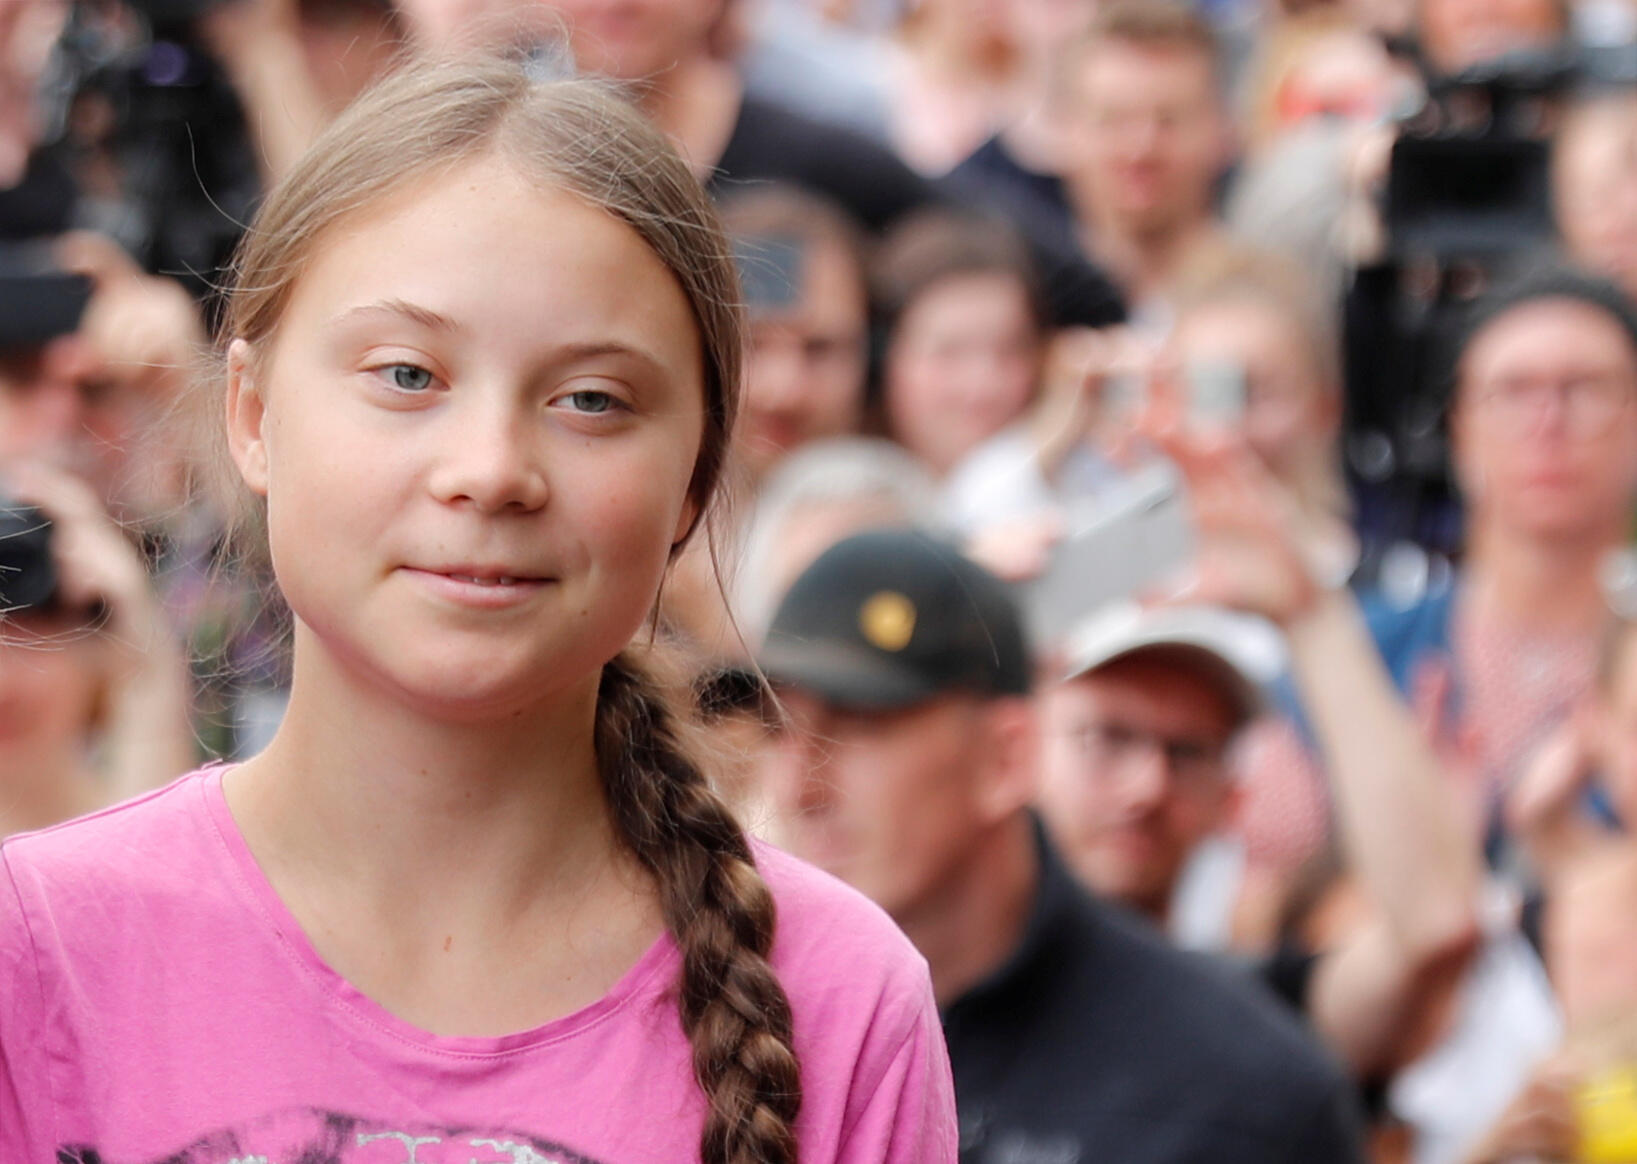 L'activiste suédoise Greta Thunberg